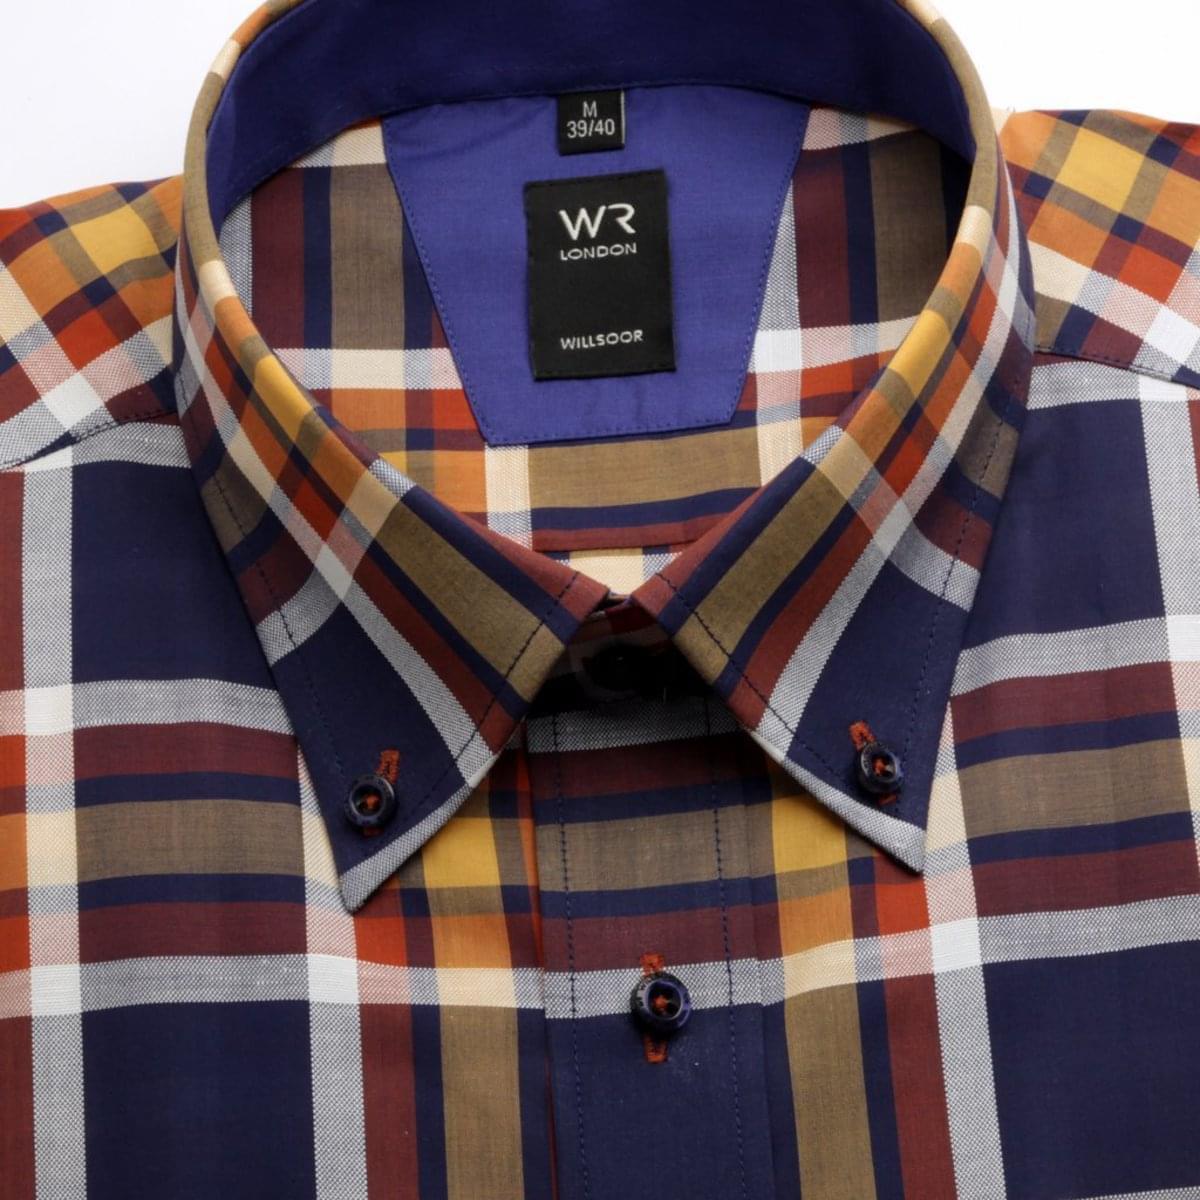 Willsoor Pánská košile WR London (výška 176-182) 1907 176-182 / L (41/42)